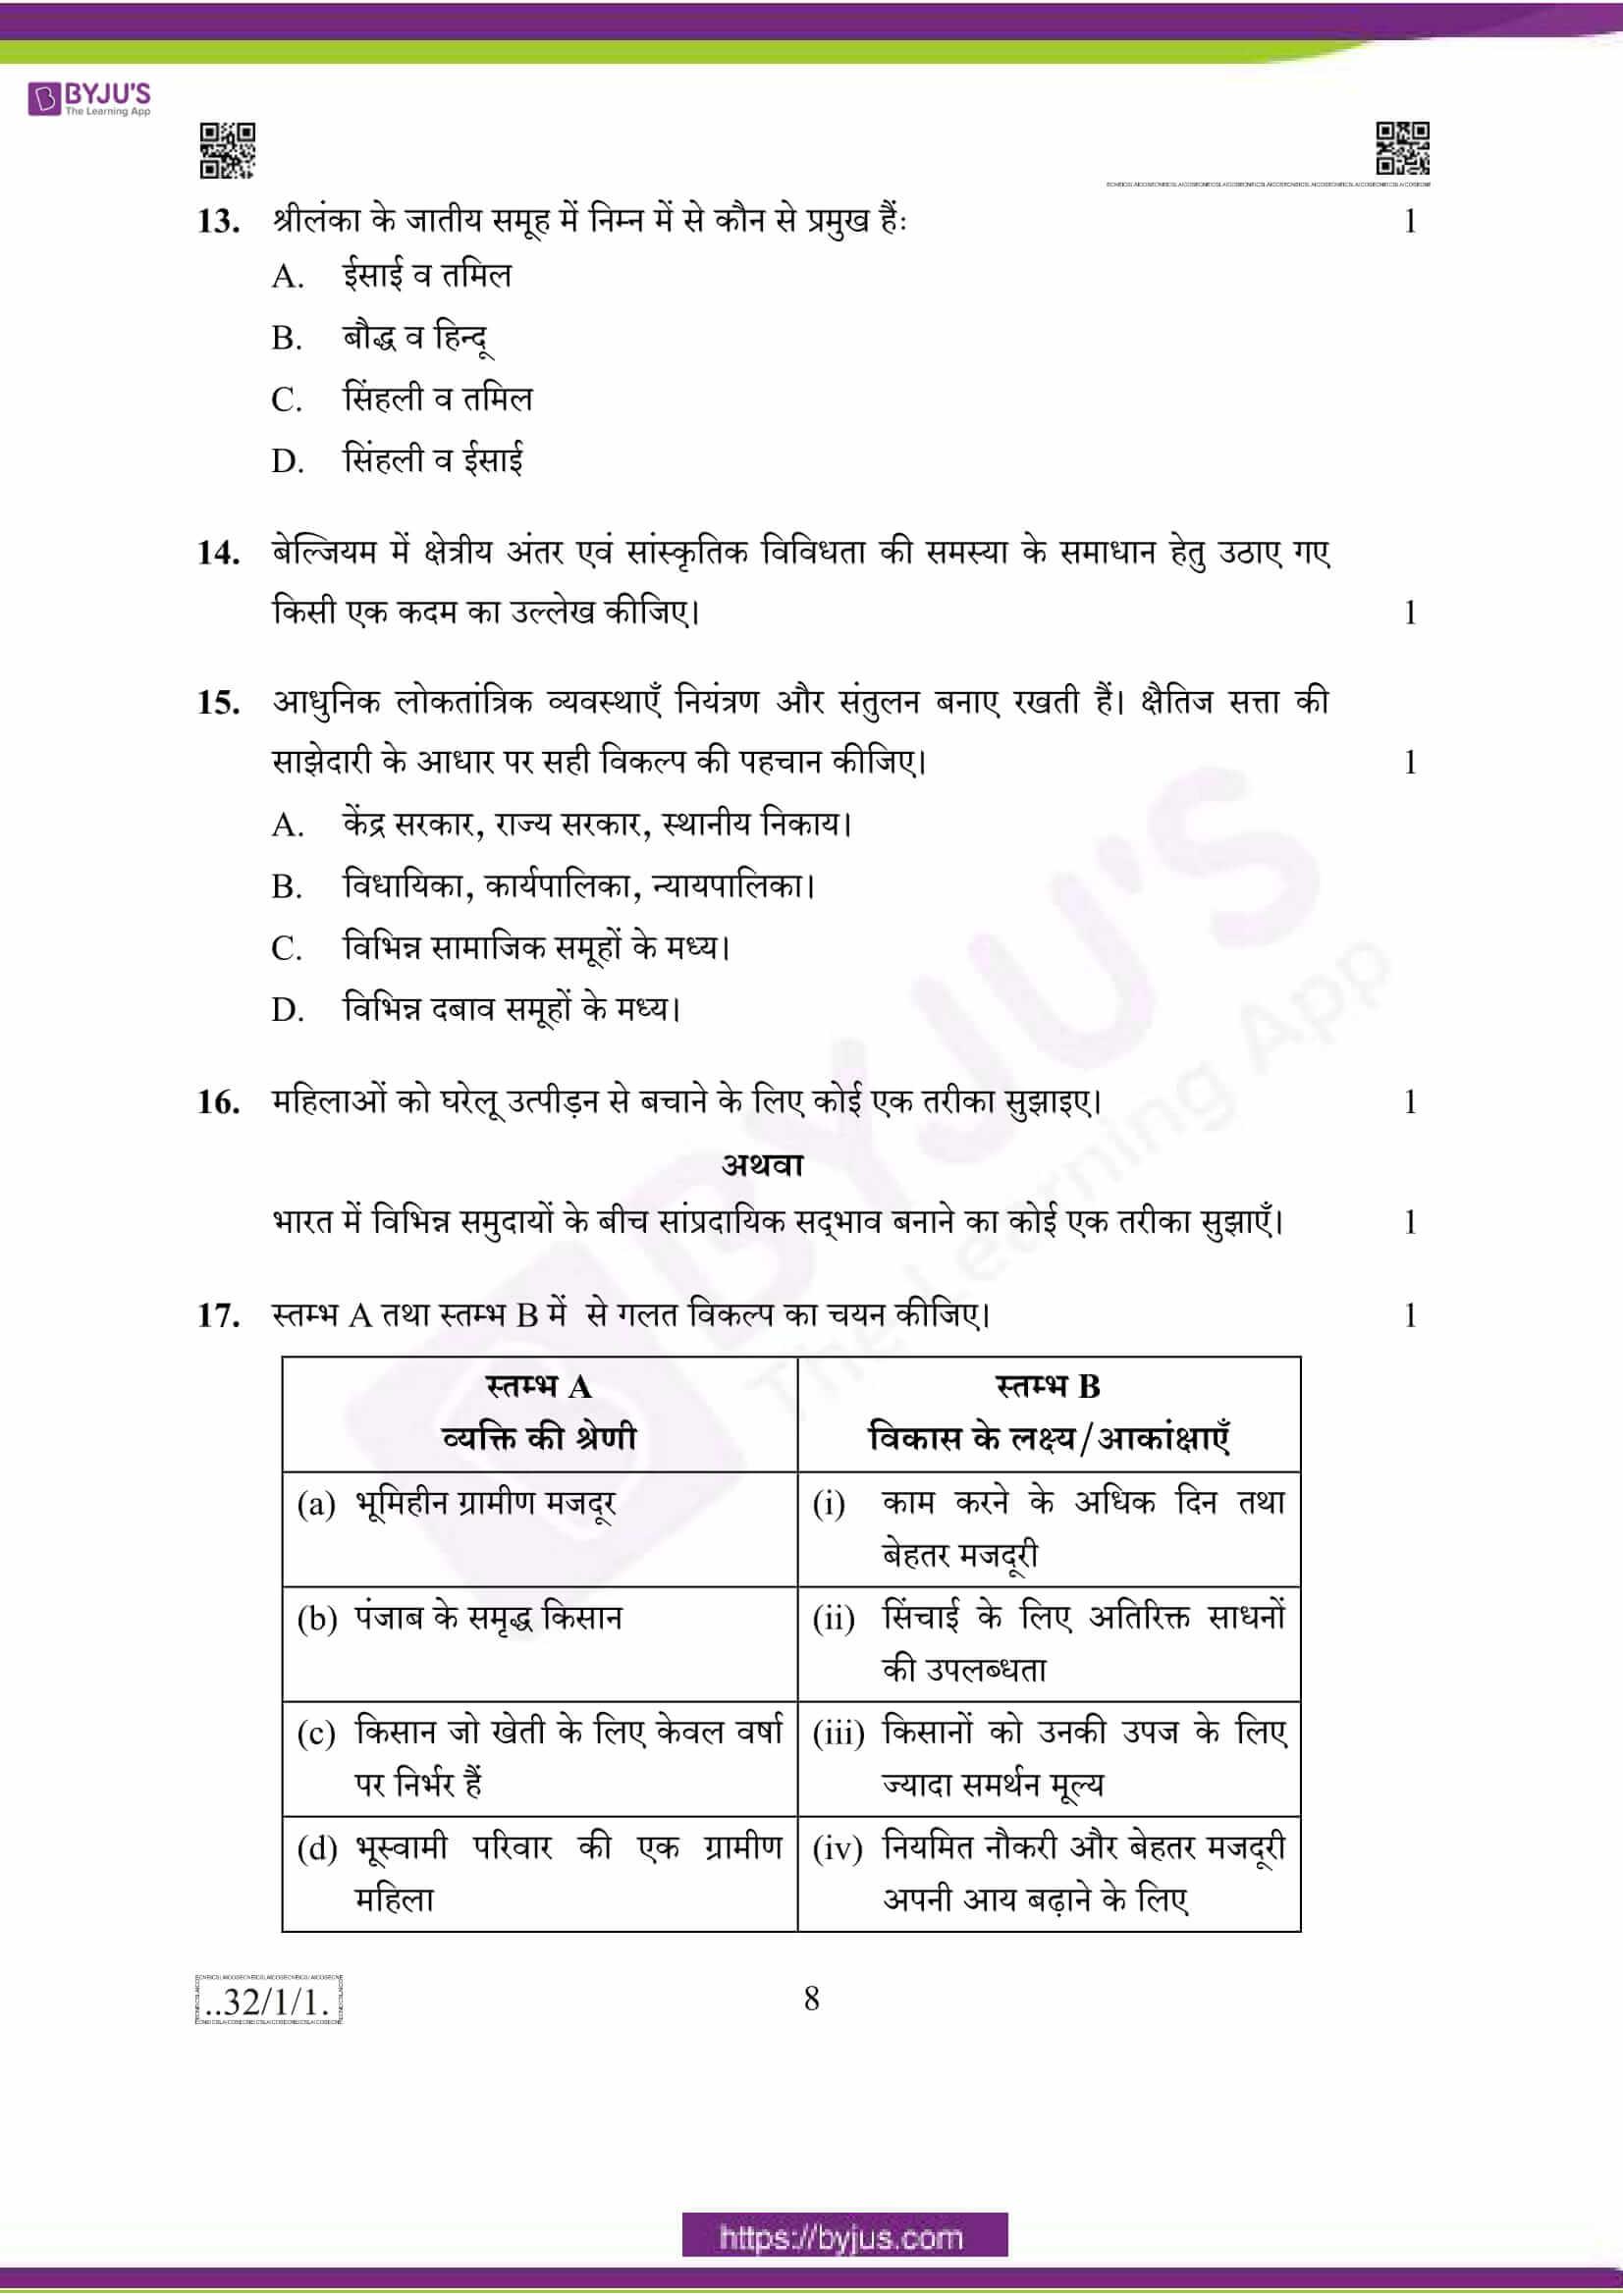 cbse class 10 social science question paper 2020 08